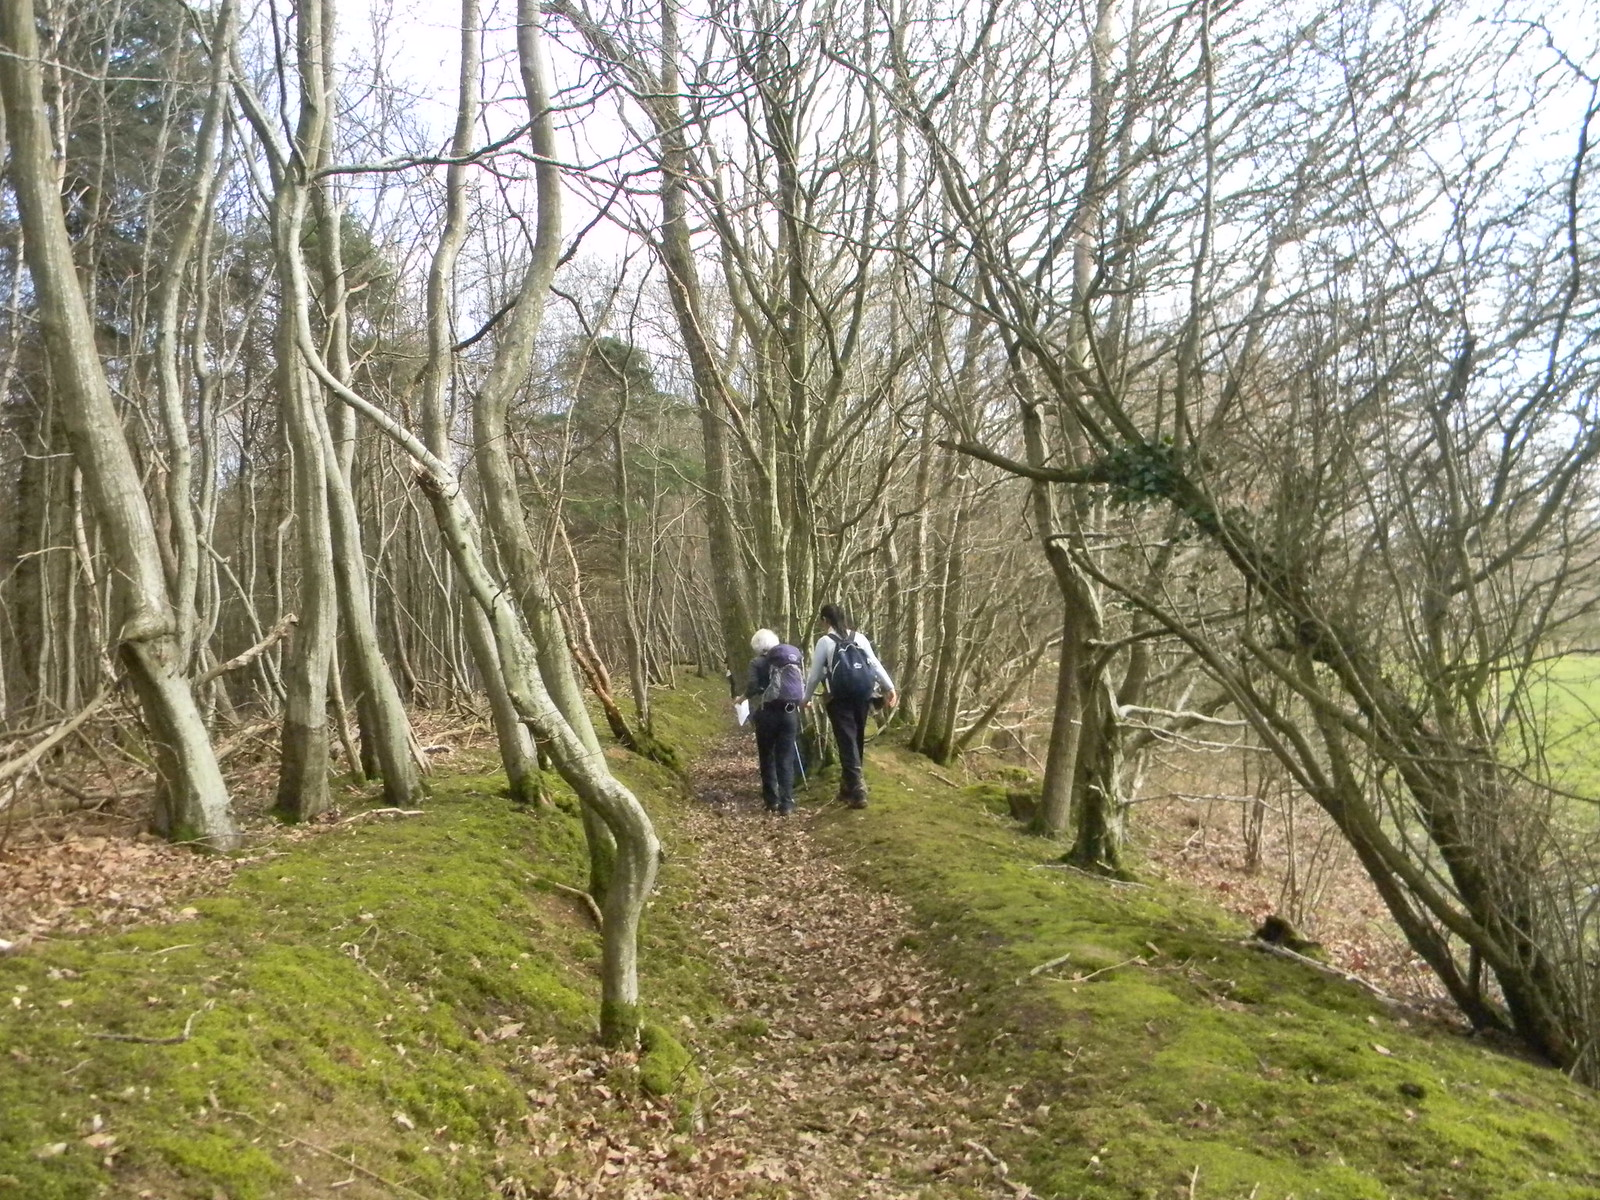 Through trees Robertsbridge to Battle